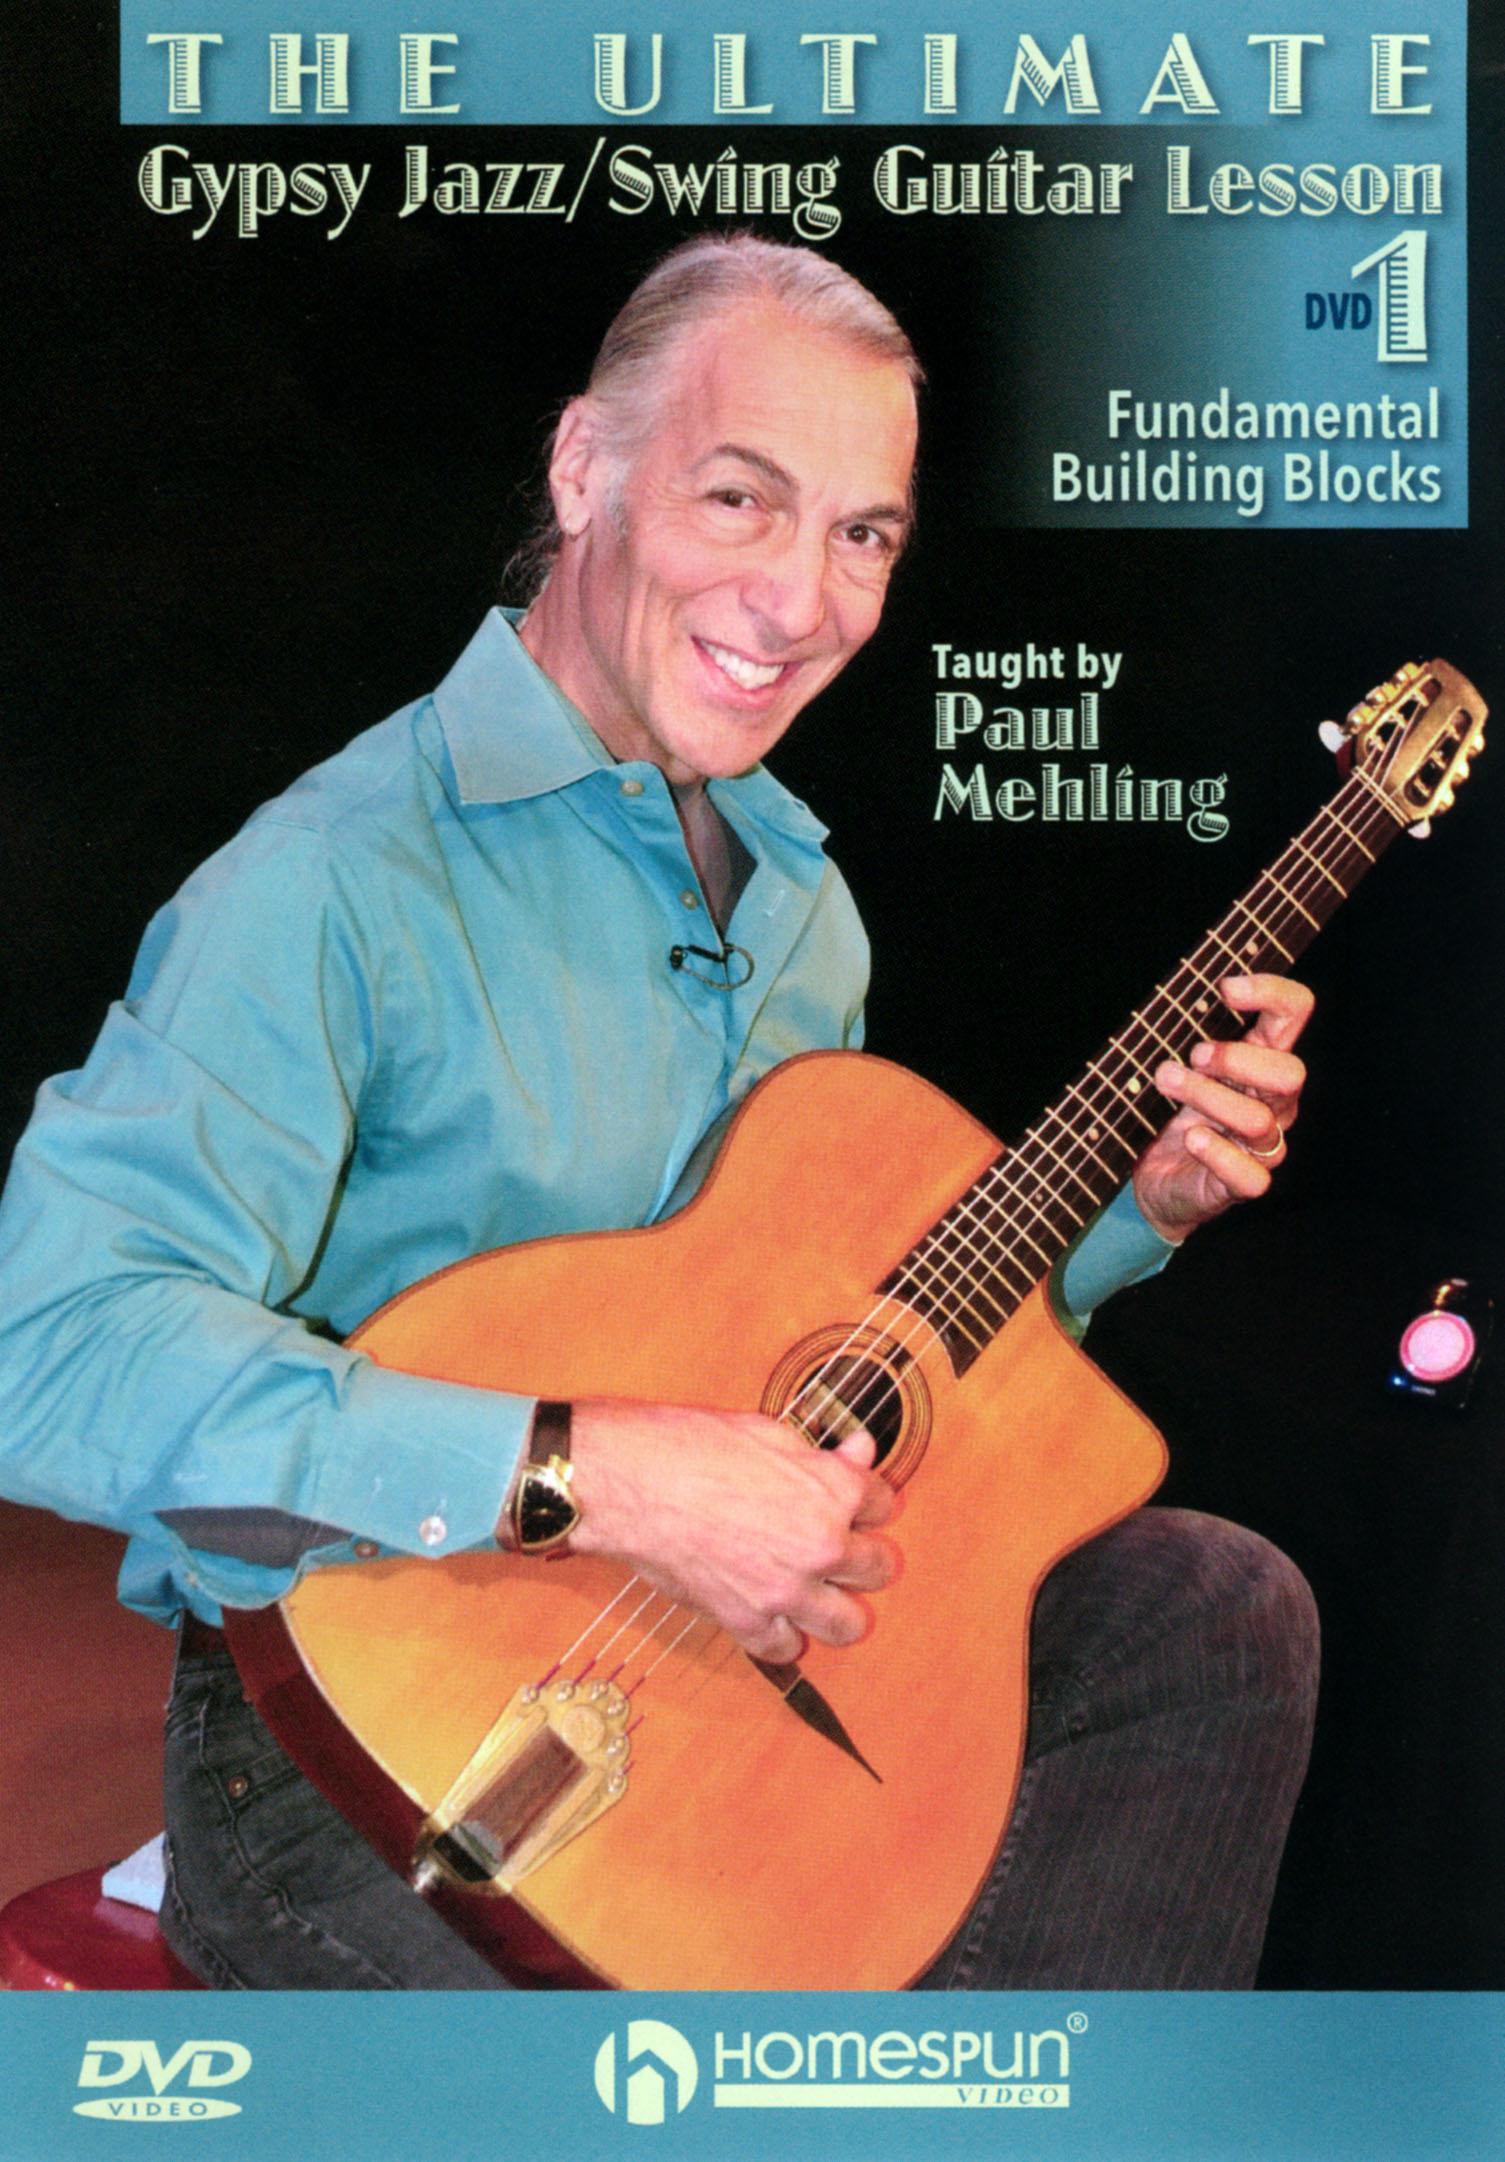 The Ultimate Gypsy Jazz/Swing Guitar Lesson: Fundamental Building Blocks